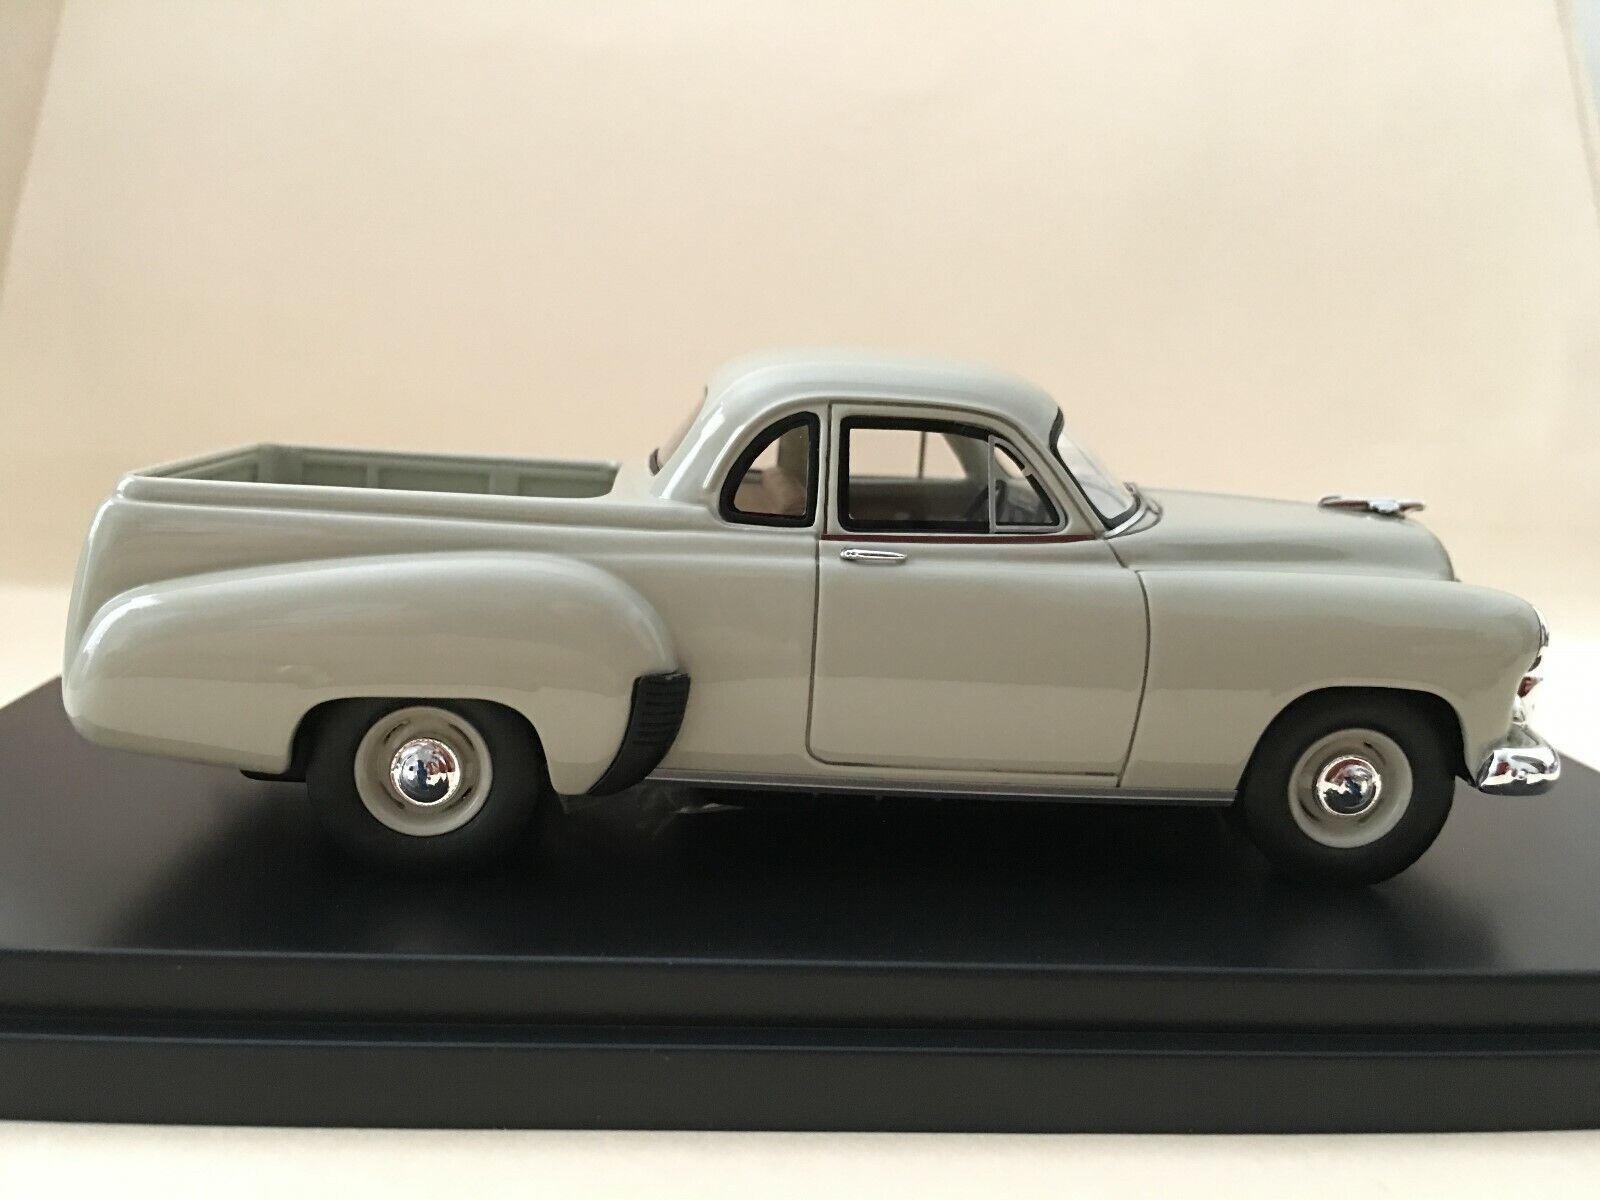 1 43 TRAX TRR71B 1951 Chevrolet Ute - Aztec Tan